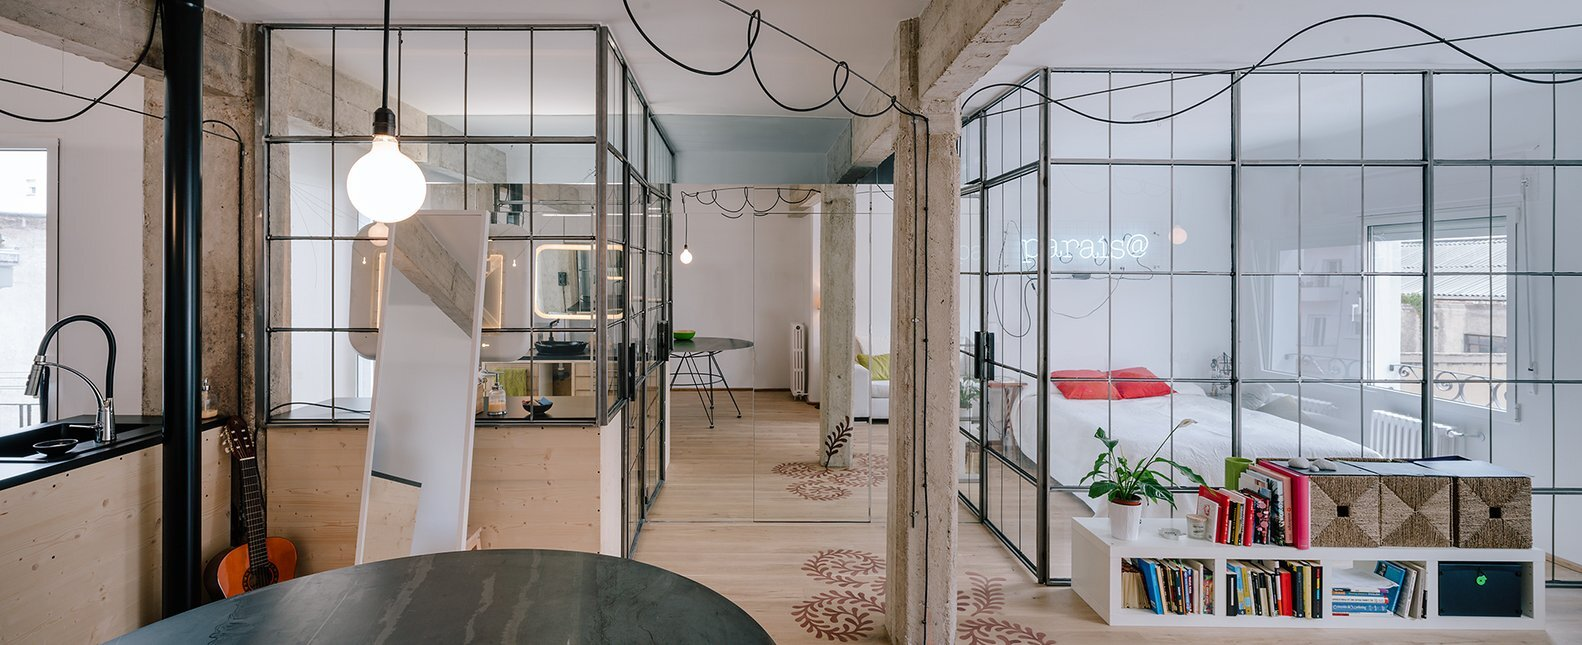 Parais - Manuel Ocaña - Madrid Spain - Glass Partitions - Humble Homes